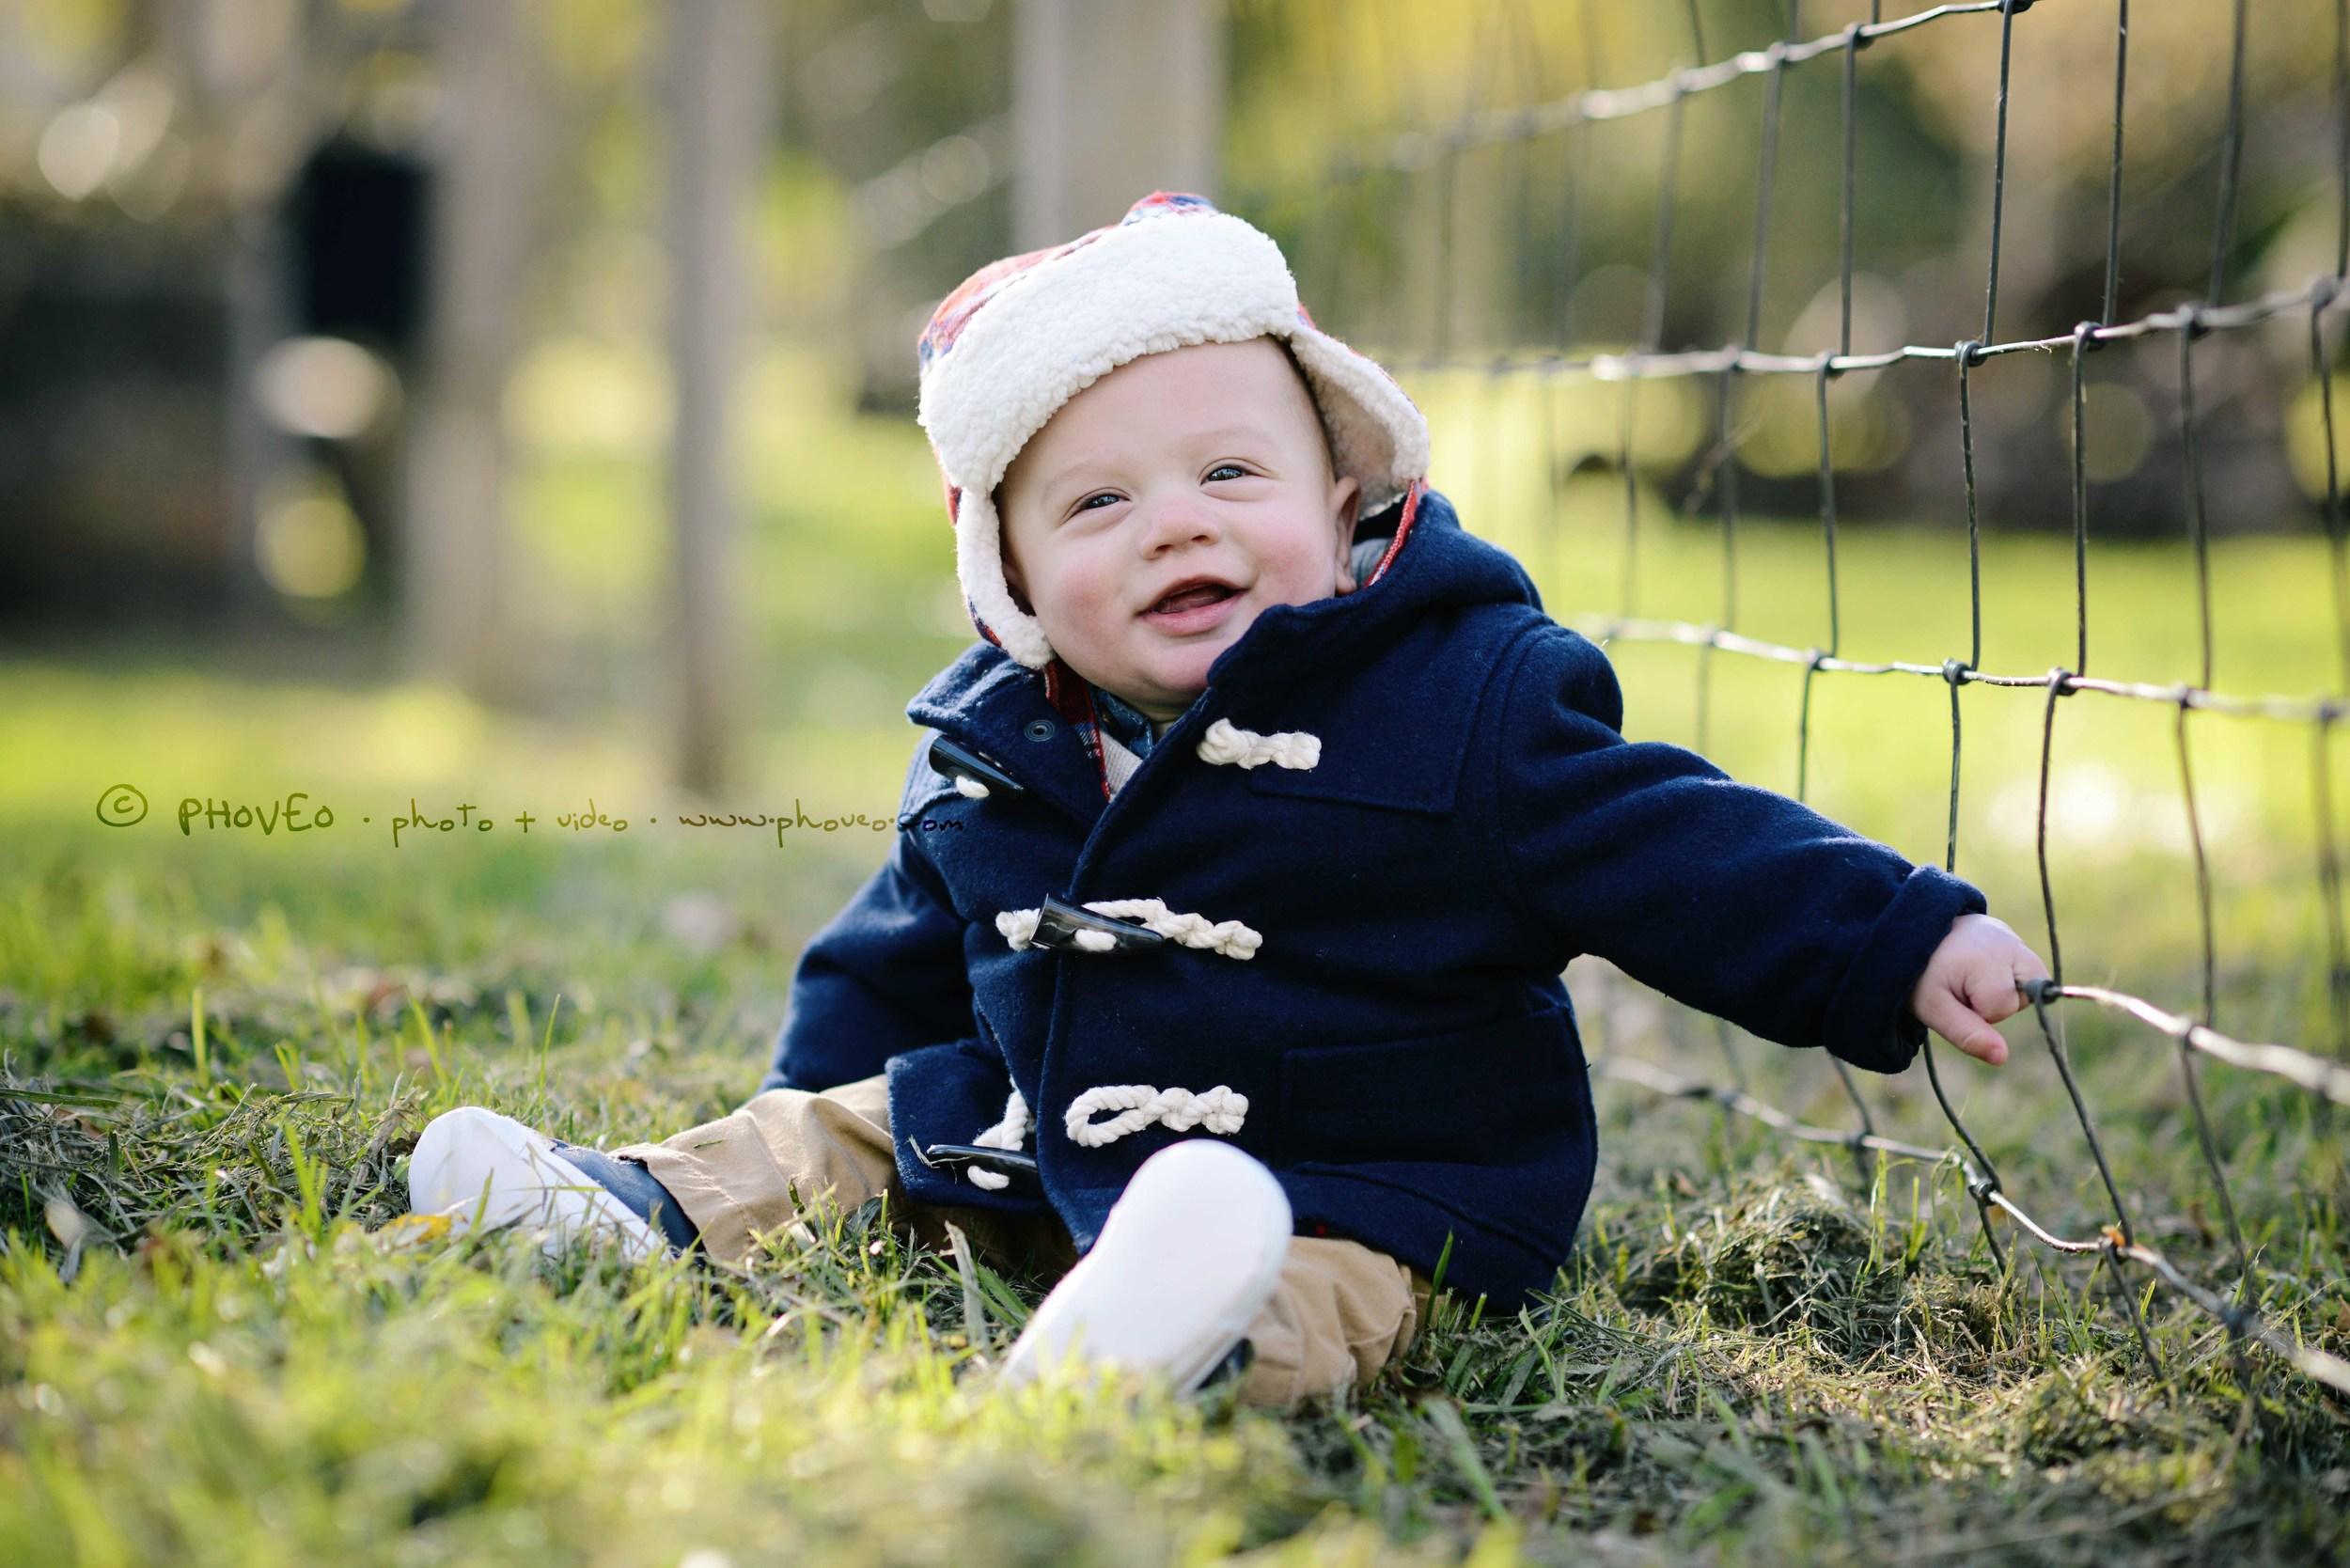 WM_20151016_Reinhardt_Family_2.jpg